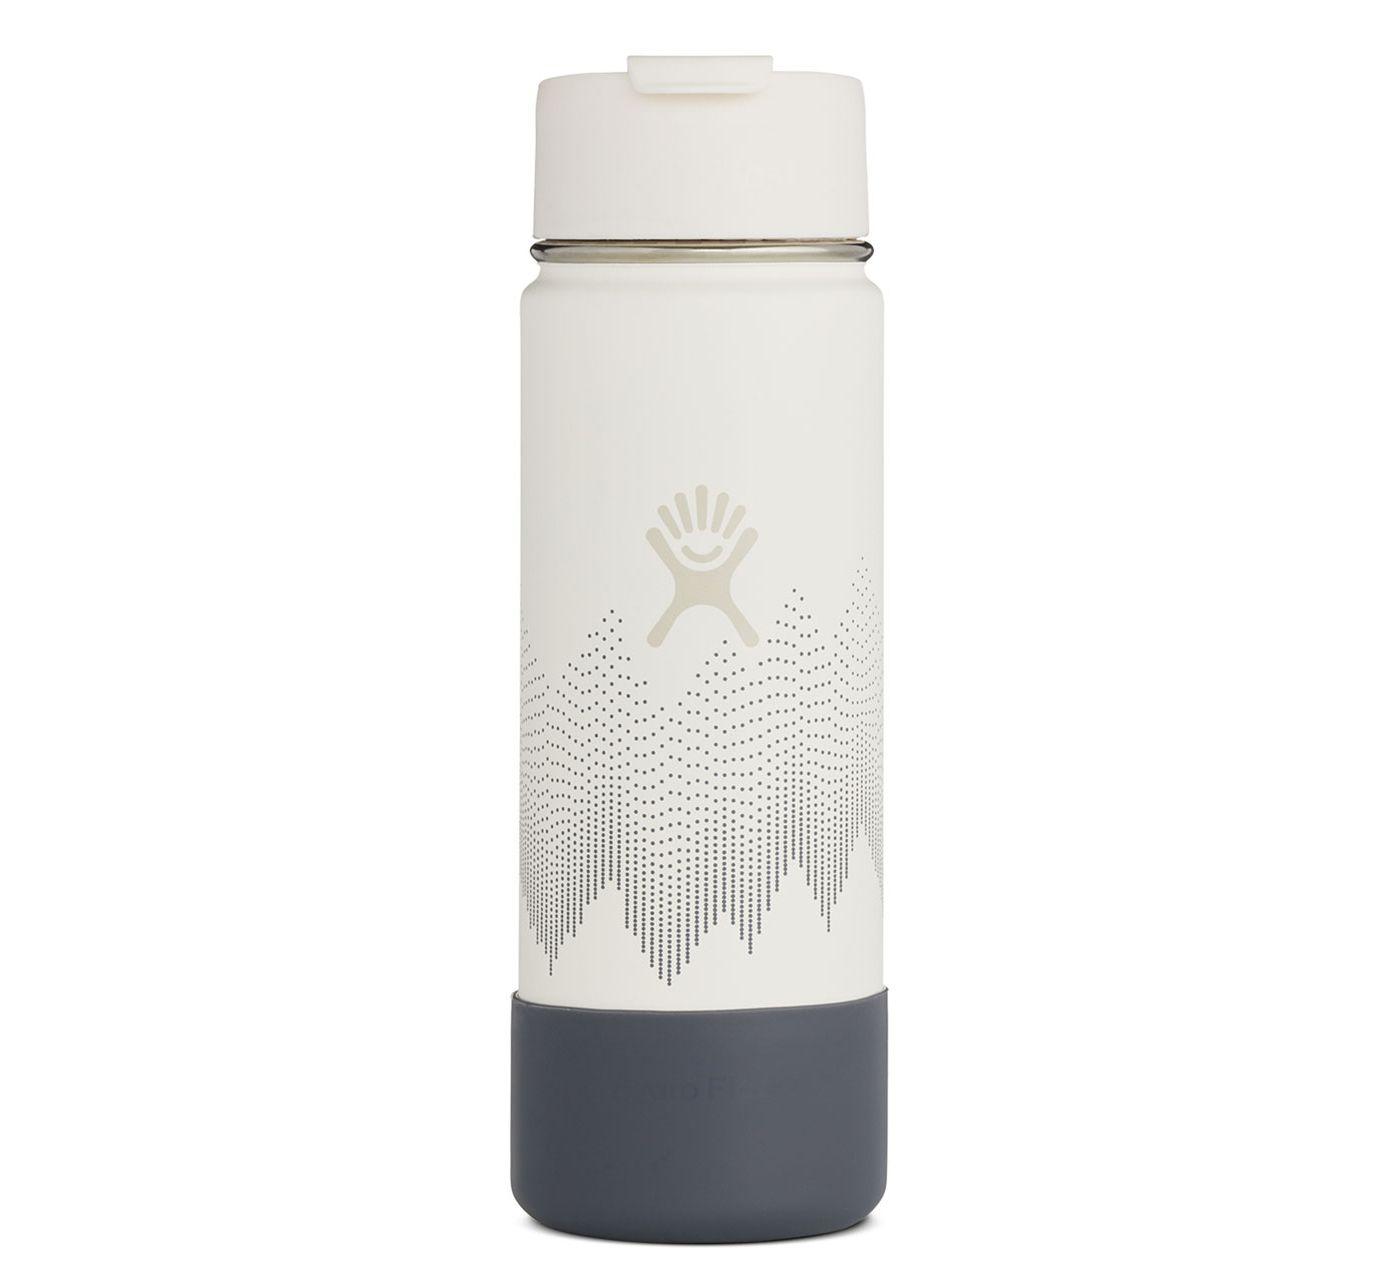 Hydro Flask Limited Edition Wonder 20 oz. Flip Top Bottle